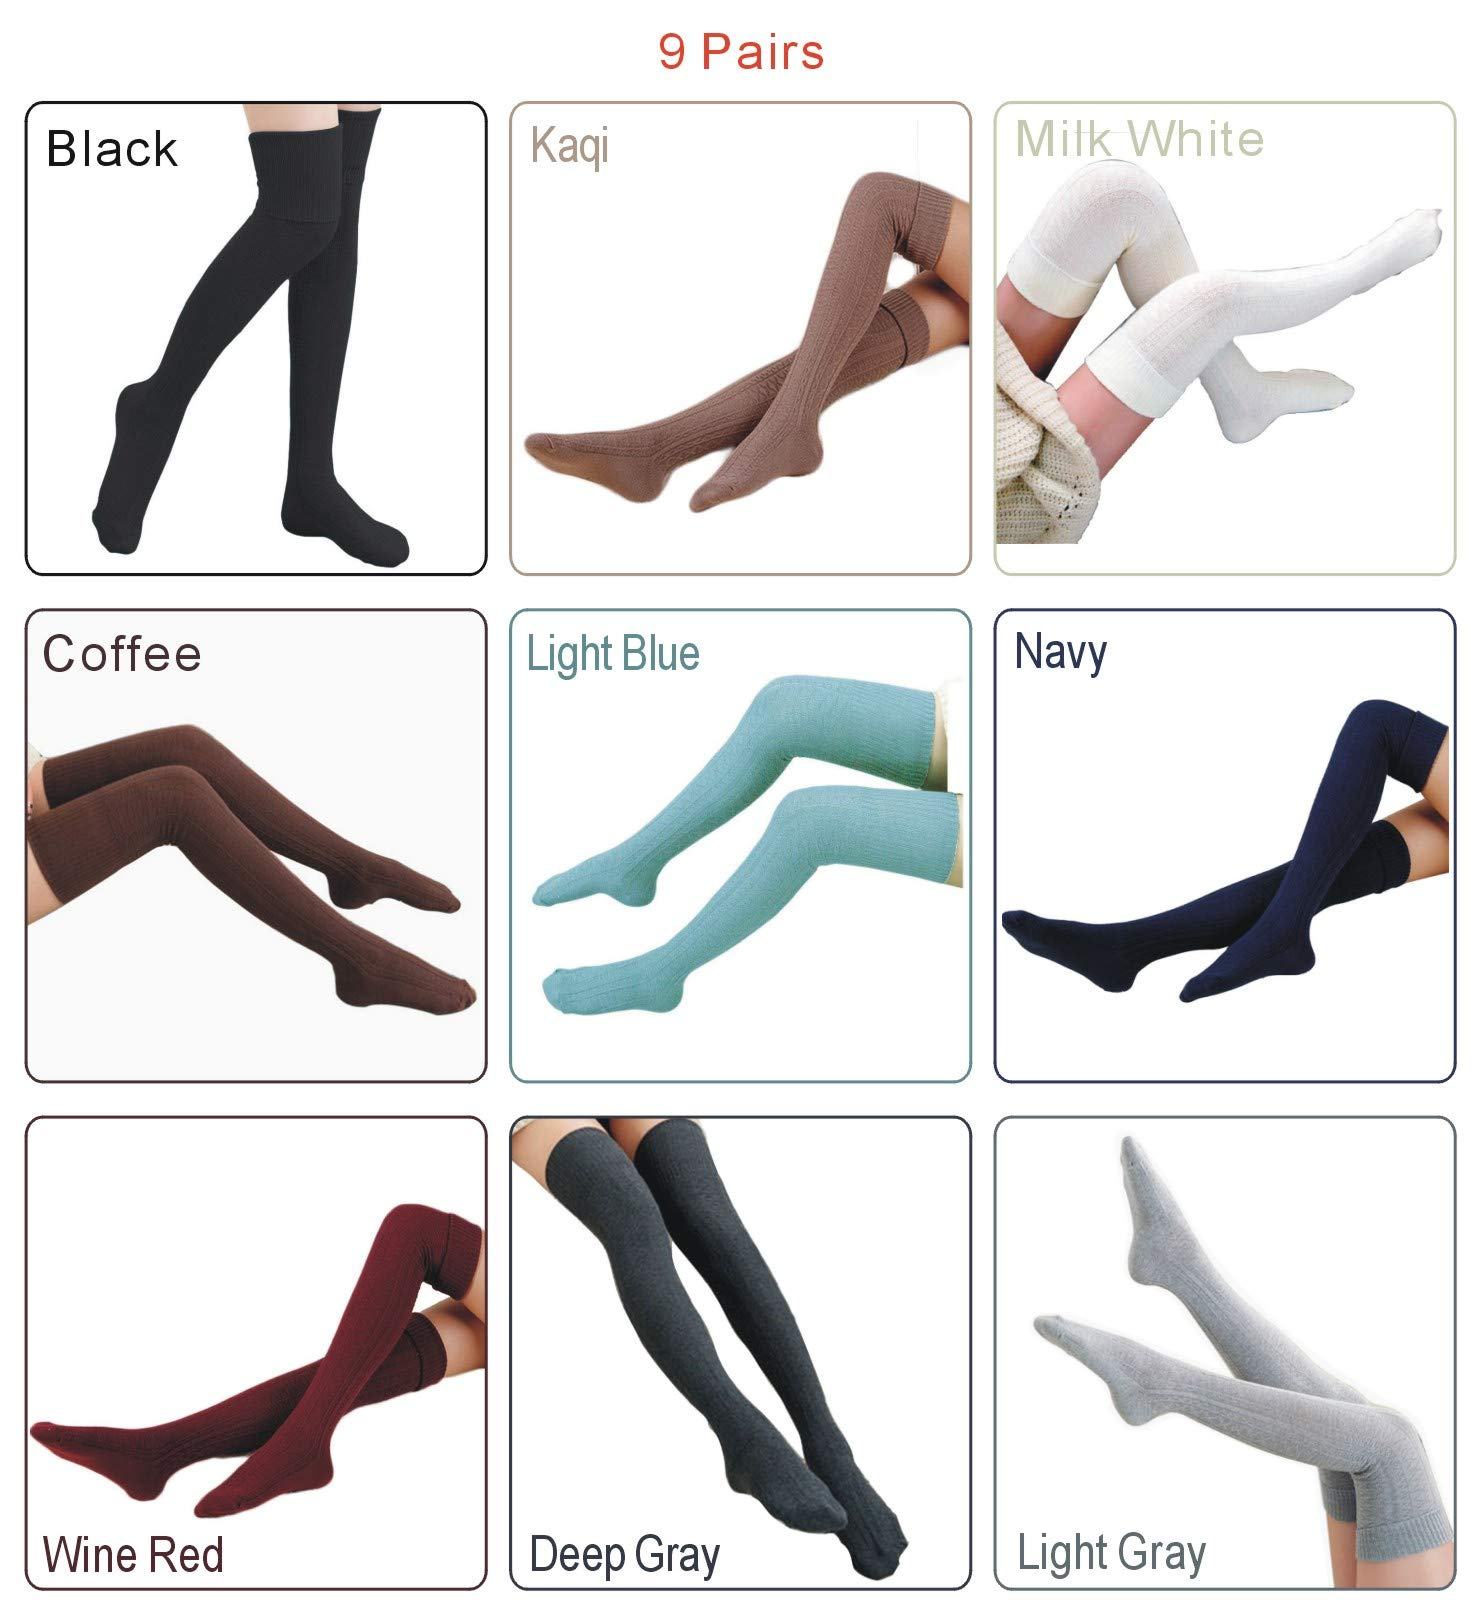 Over Knee Leg Warmer Crochet Thigh High Socks Crochet Long Socks Leg Warmer Leggings For Girls Womens (9 Pairs)